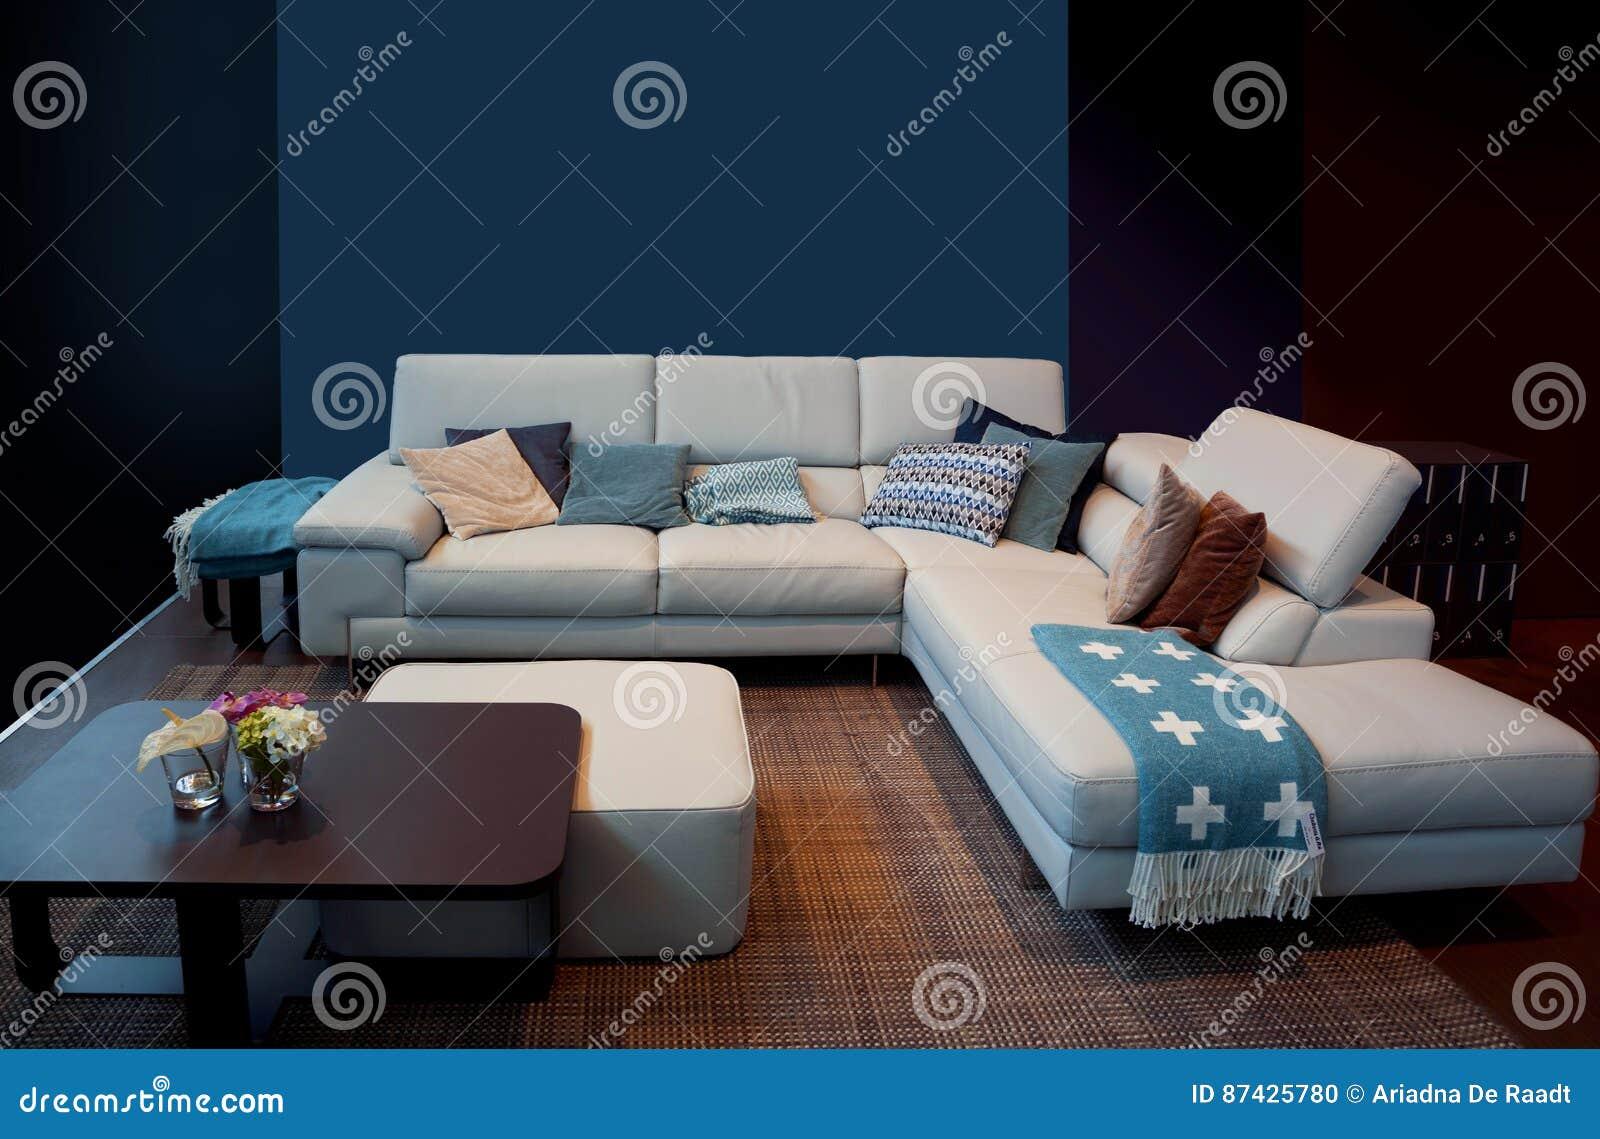 Detalle del interior casero azul